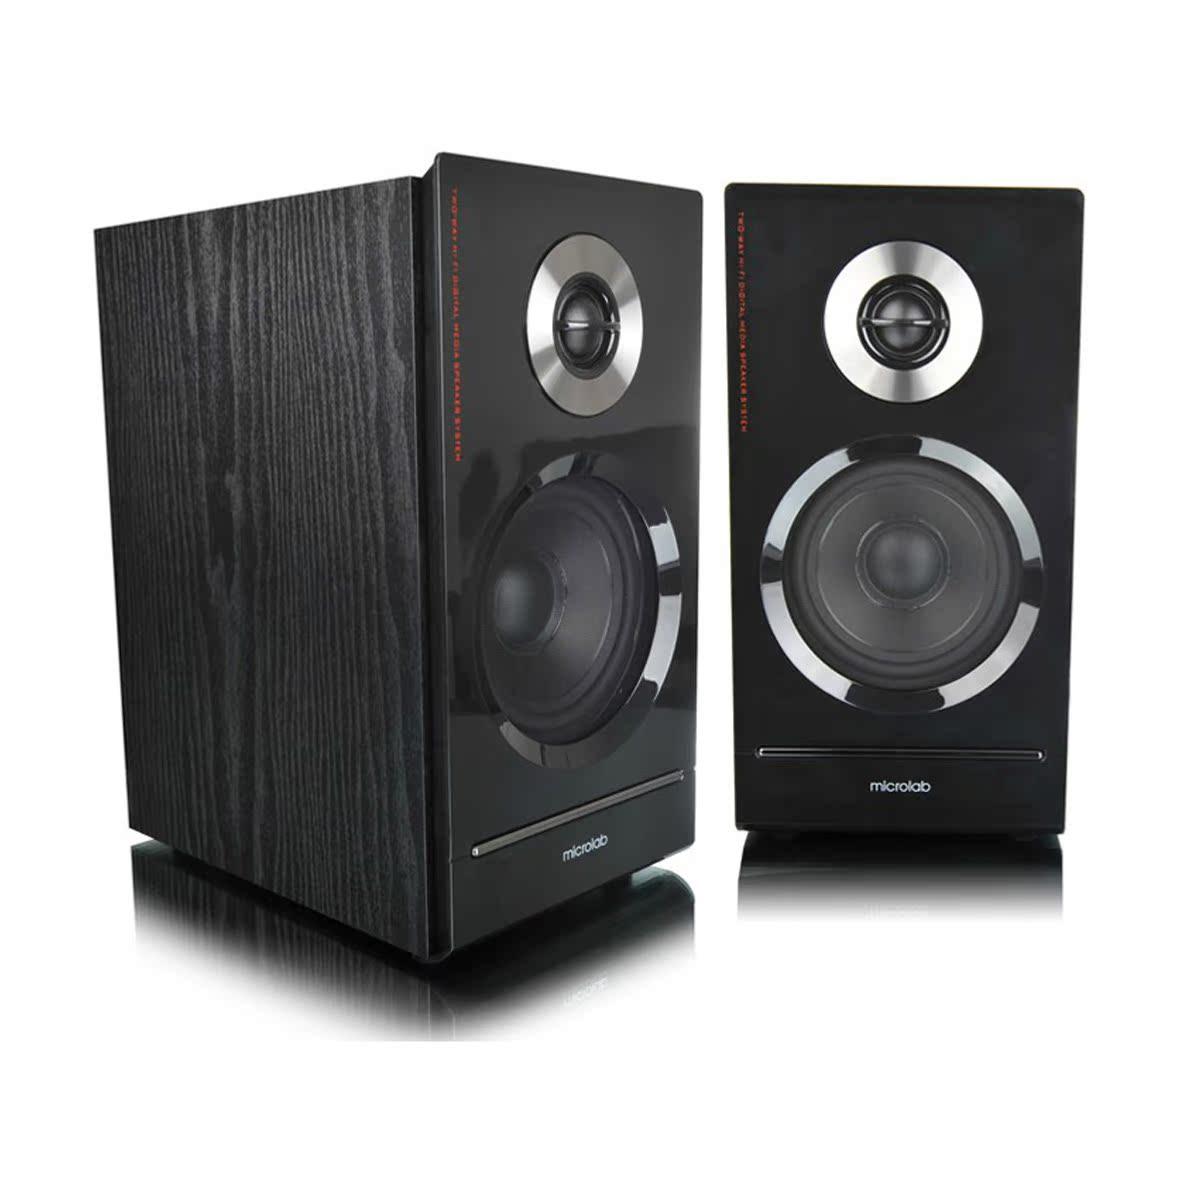 Мультимедийная акустика Microlab FC260 2.0